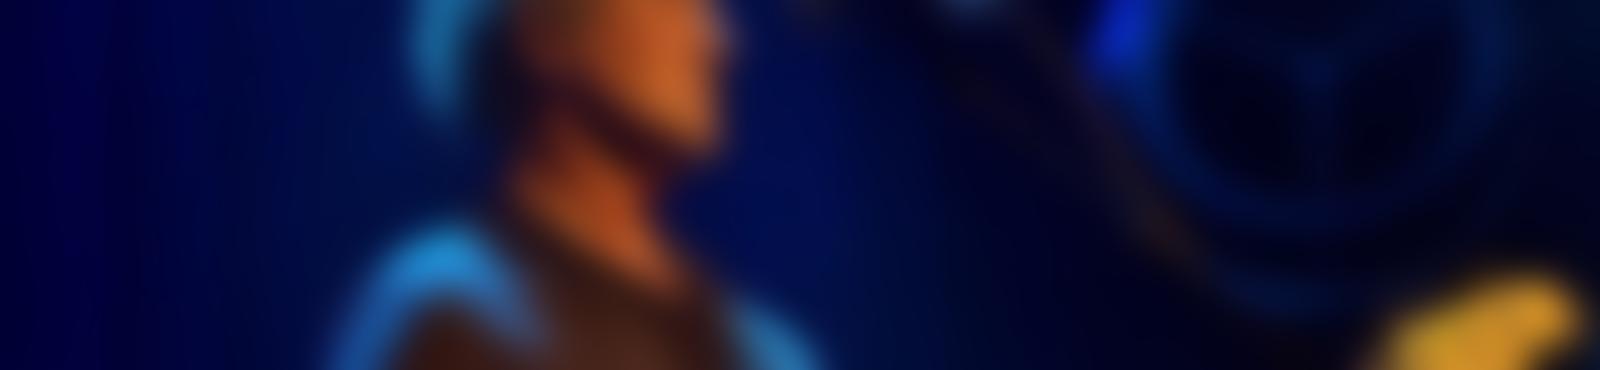 Blurred a00e7dc2 0a62 4c5b 956d cee21b88a4b7